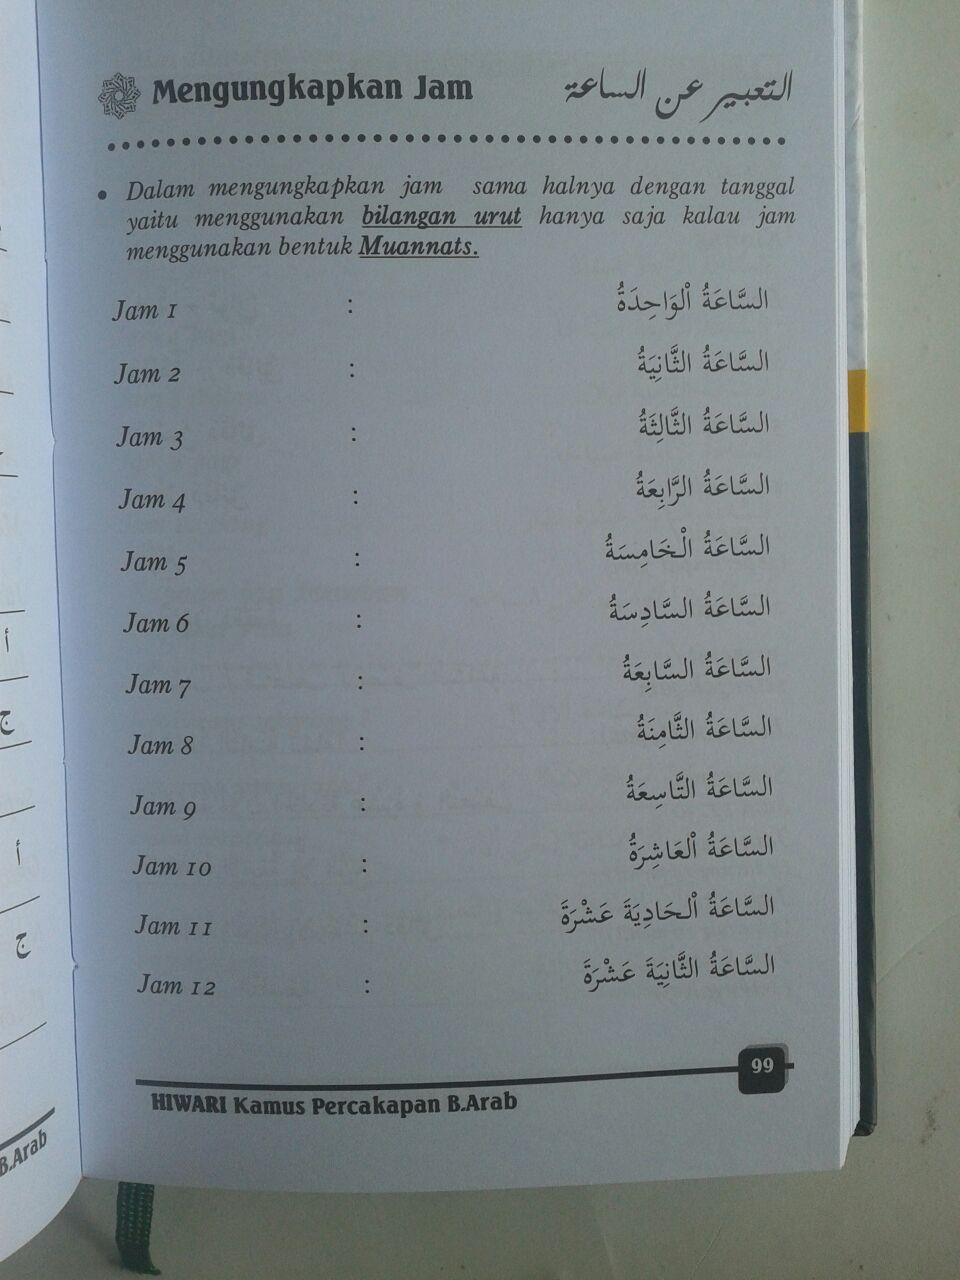 Buku Hiwari Kamus Percakapan Bahasa Arab isi 2